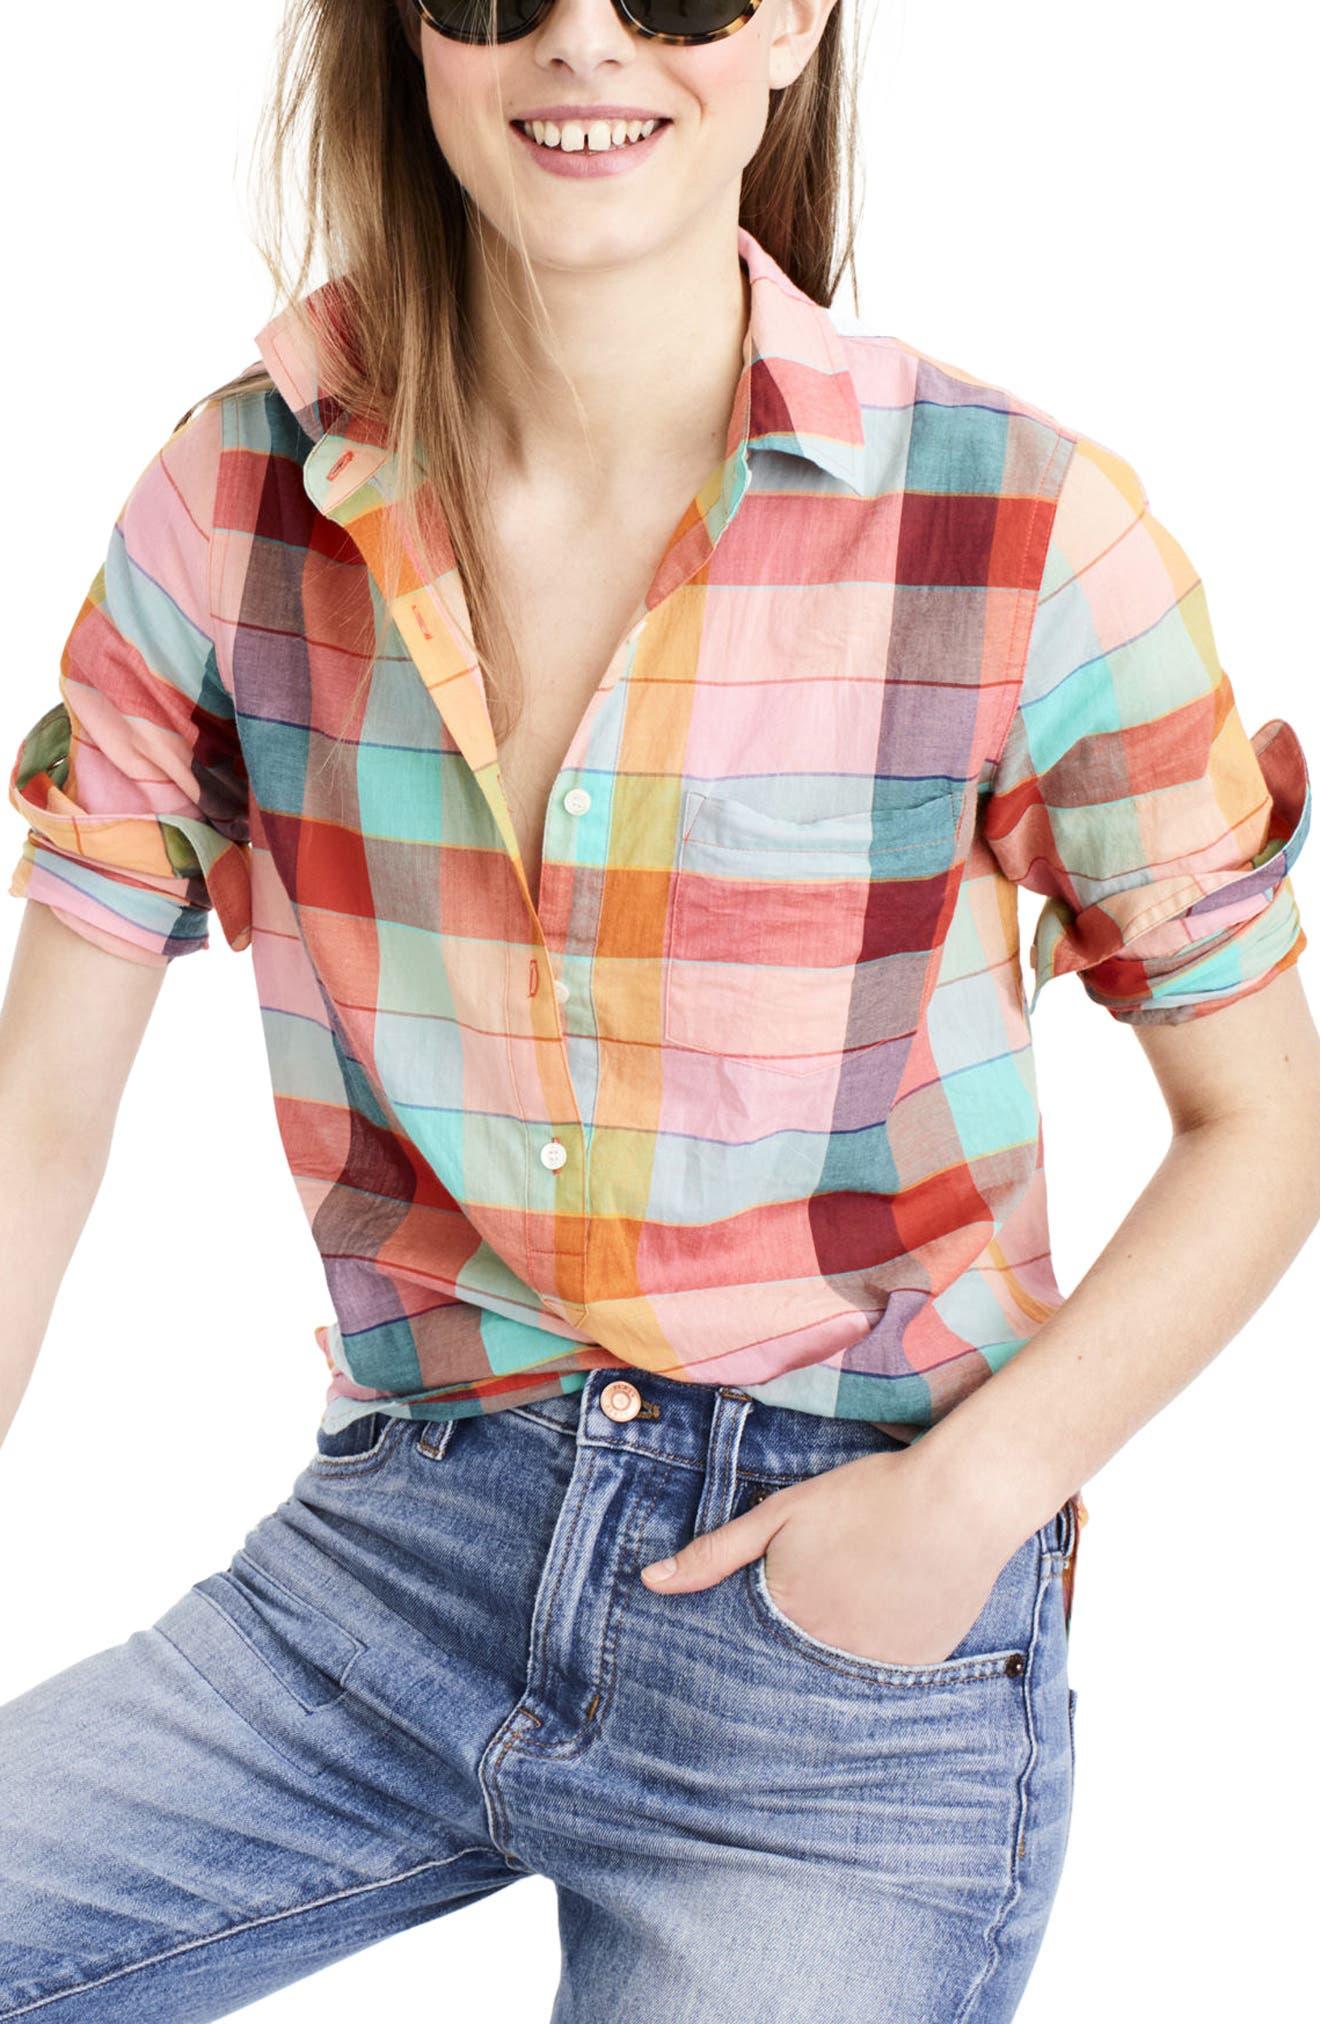 Alternate Image 1 Selected - J.Crew Rainbow Vintage Plaid Lightweight Popover Shirt (Regular & Petite)